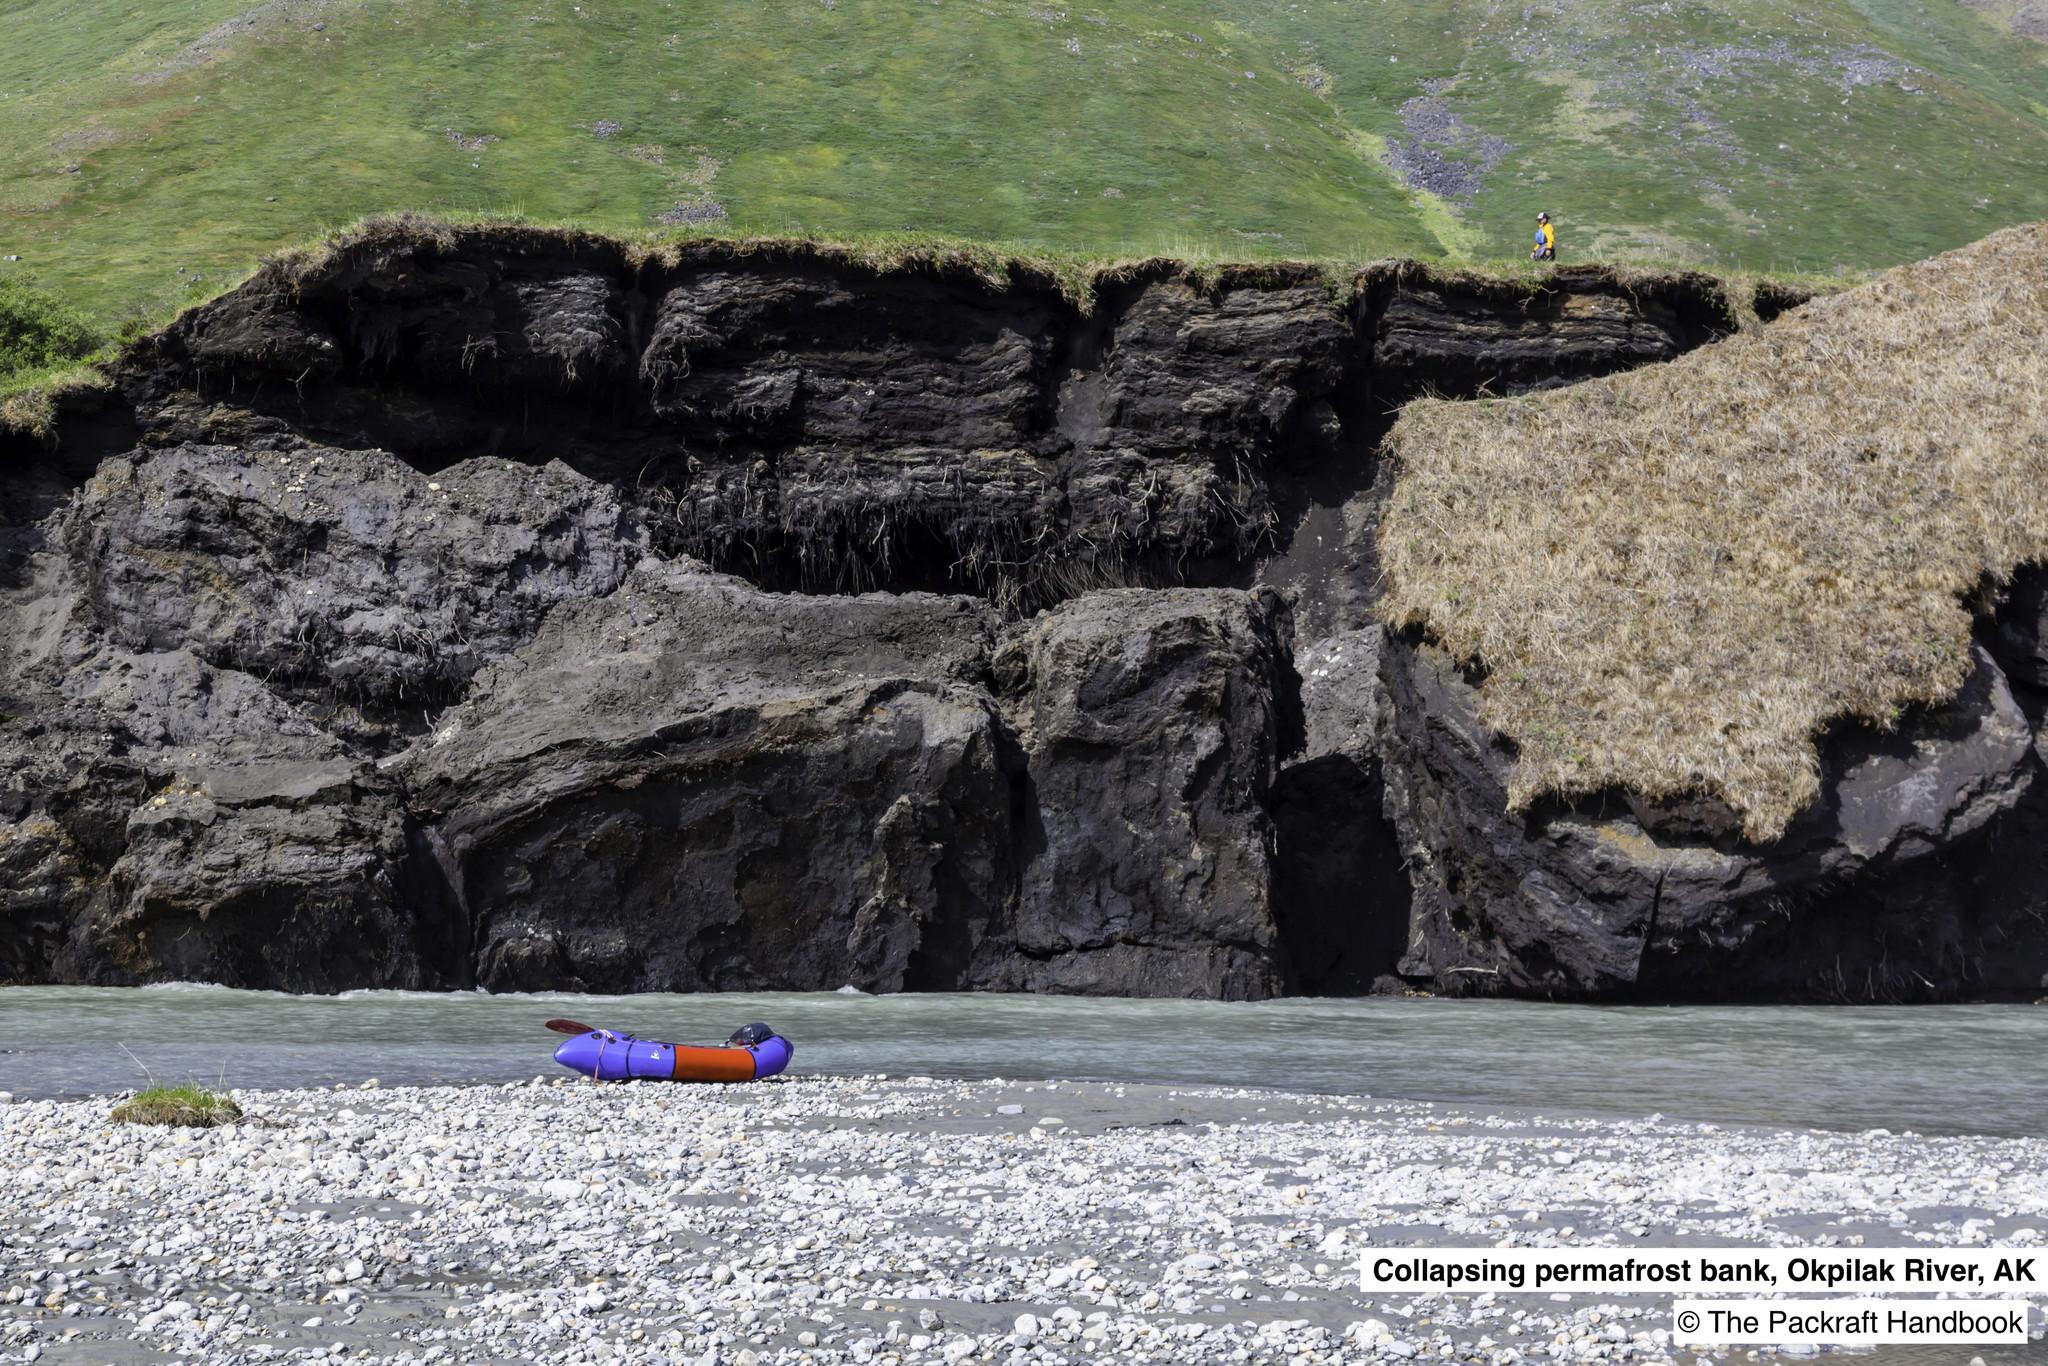 Collapsing Permafrost Bank on the Okpliak Rive, AK